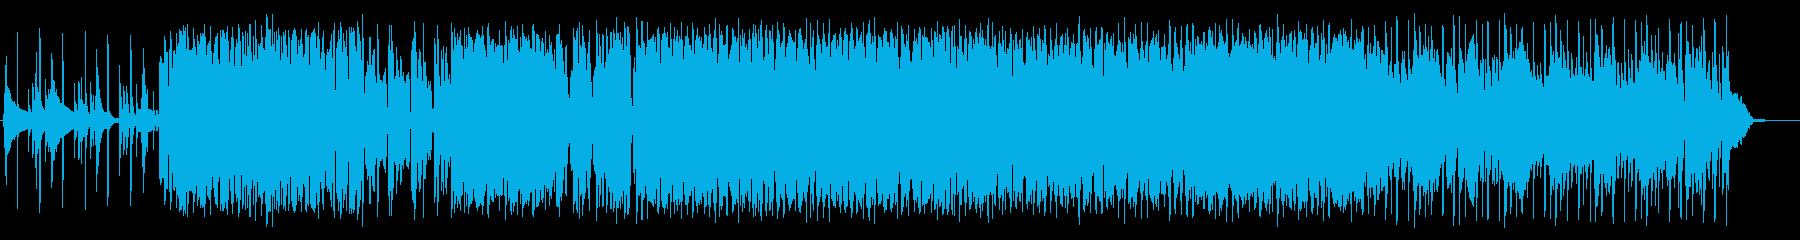 EDMっぽさもあるポップス風BGMの再生済みの波形